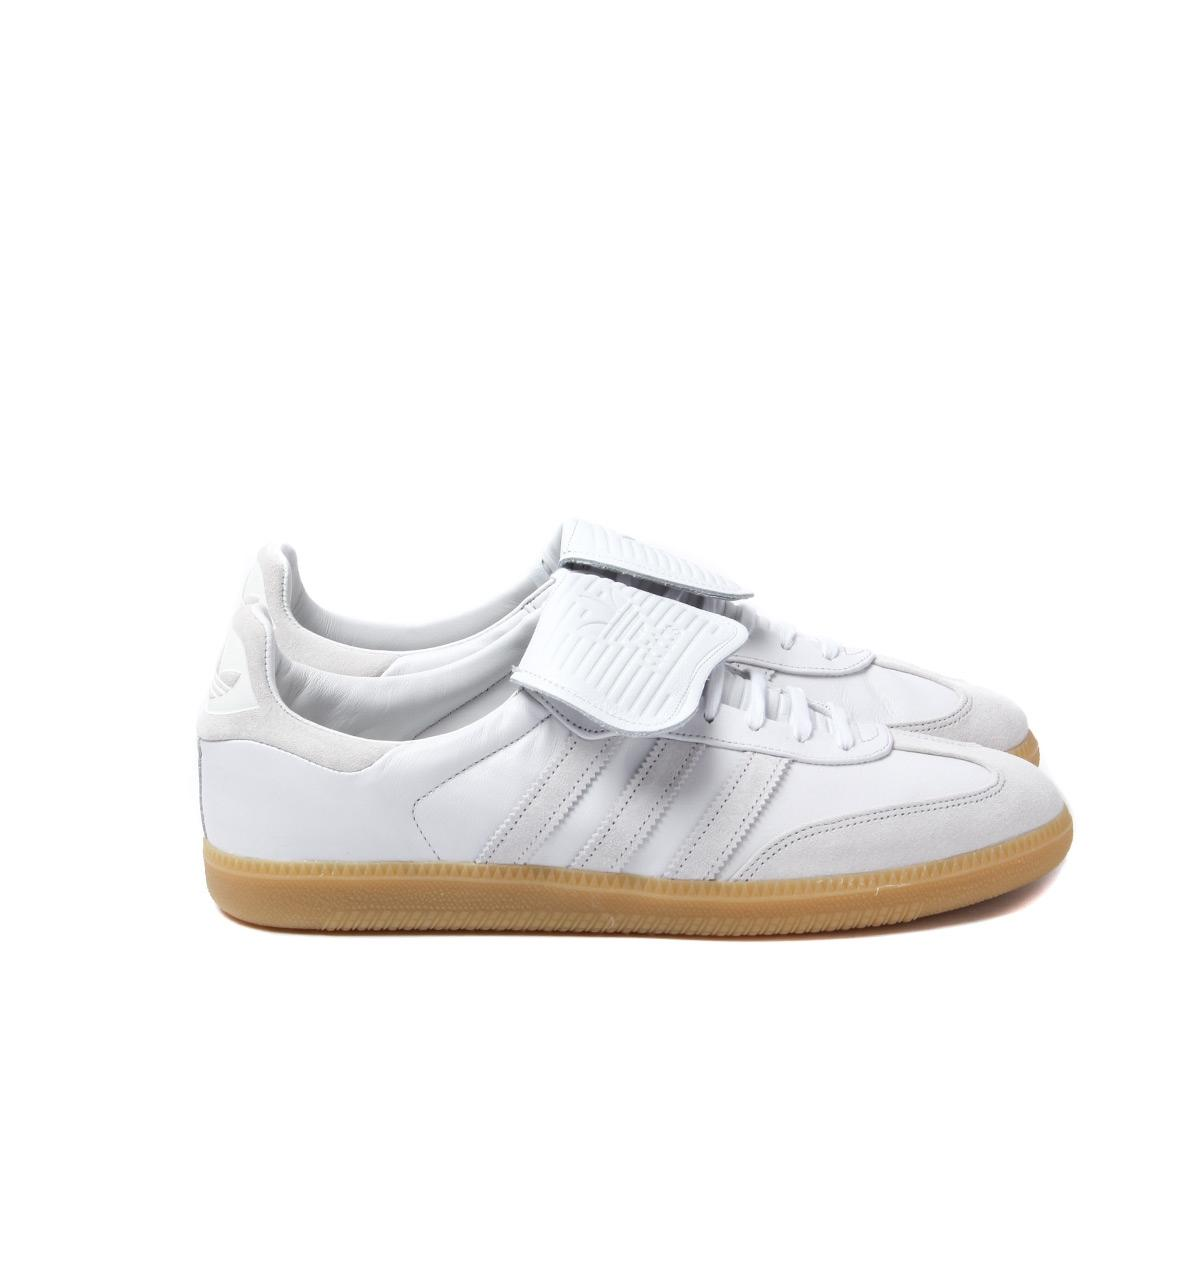 d36c5936741 Adidas Originals - Adidas Samba Recon Lt Crystal White Trainers for Men -  Lyst. View fullscreen